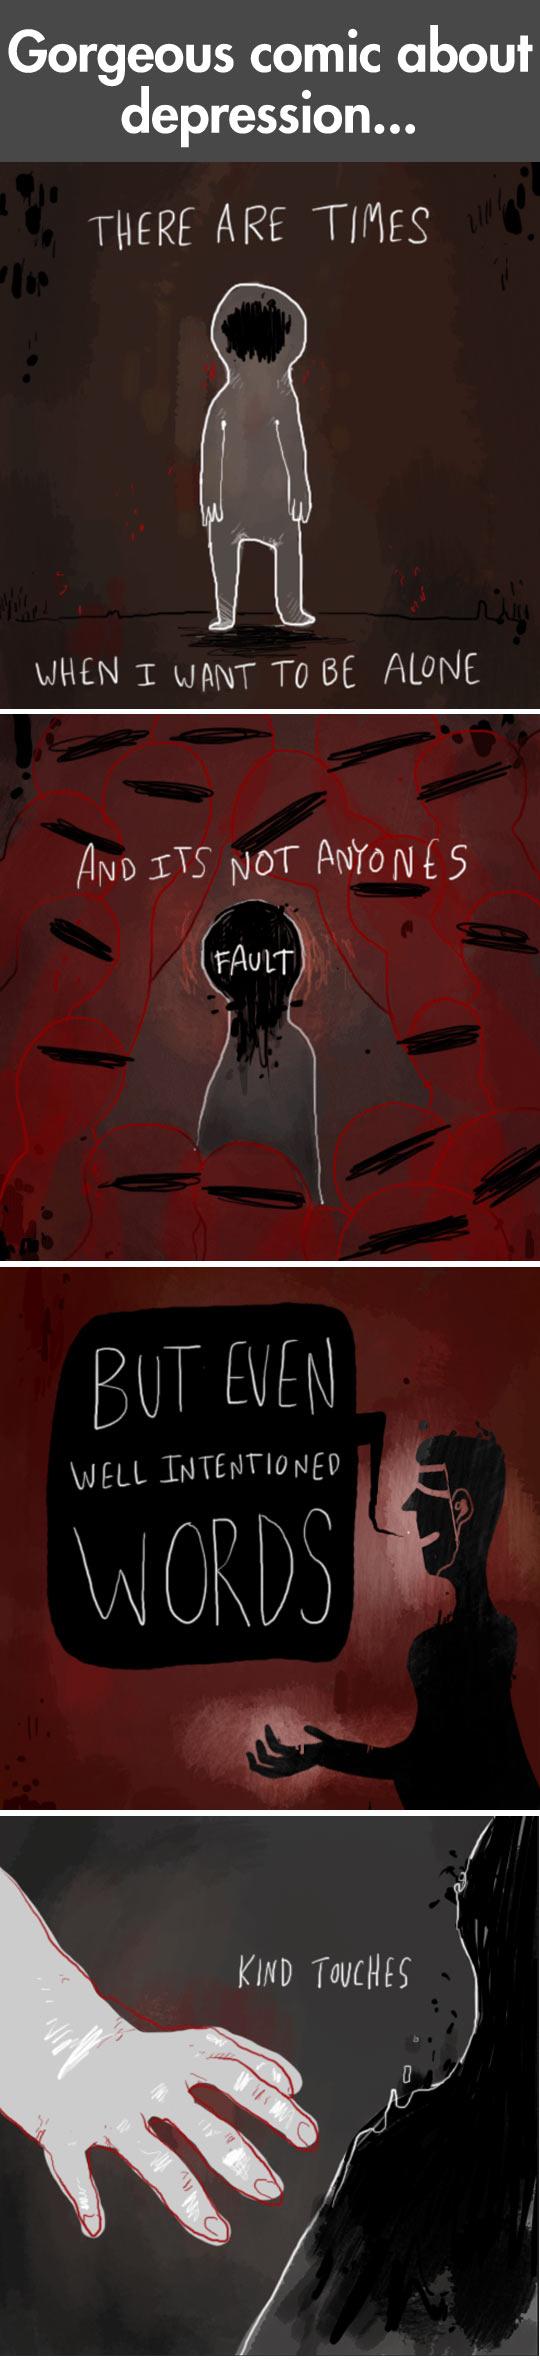 cool-depression-cartoon-comic-people